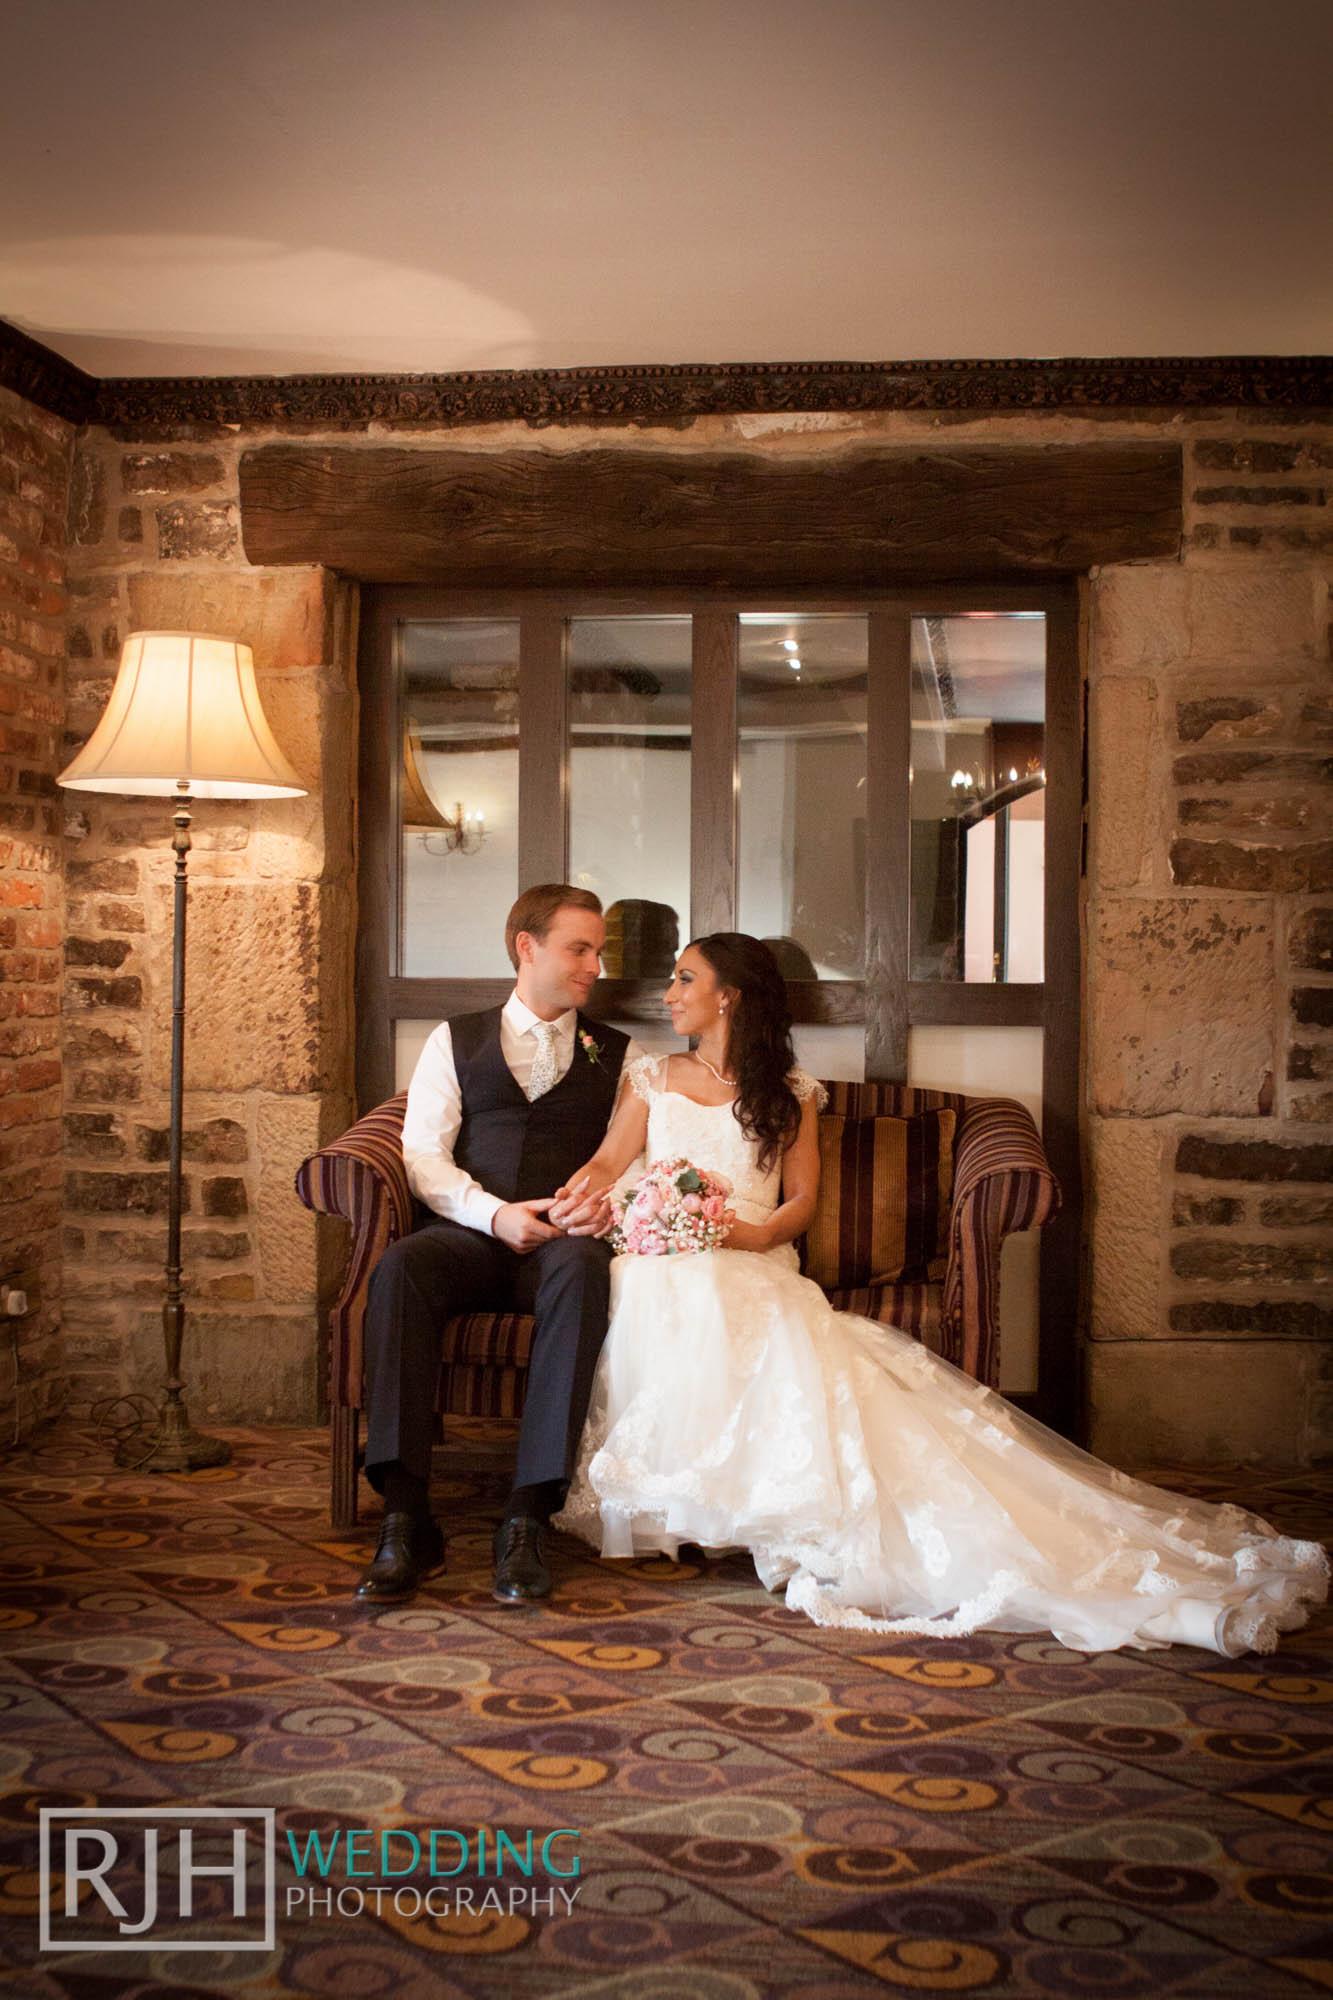 RJH Wedding Photography_Tankersley Manor Wedding_38.jpg